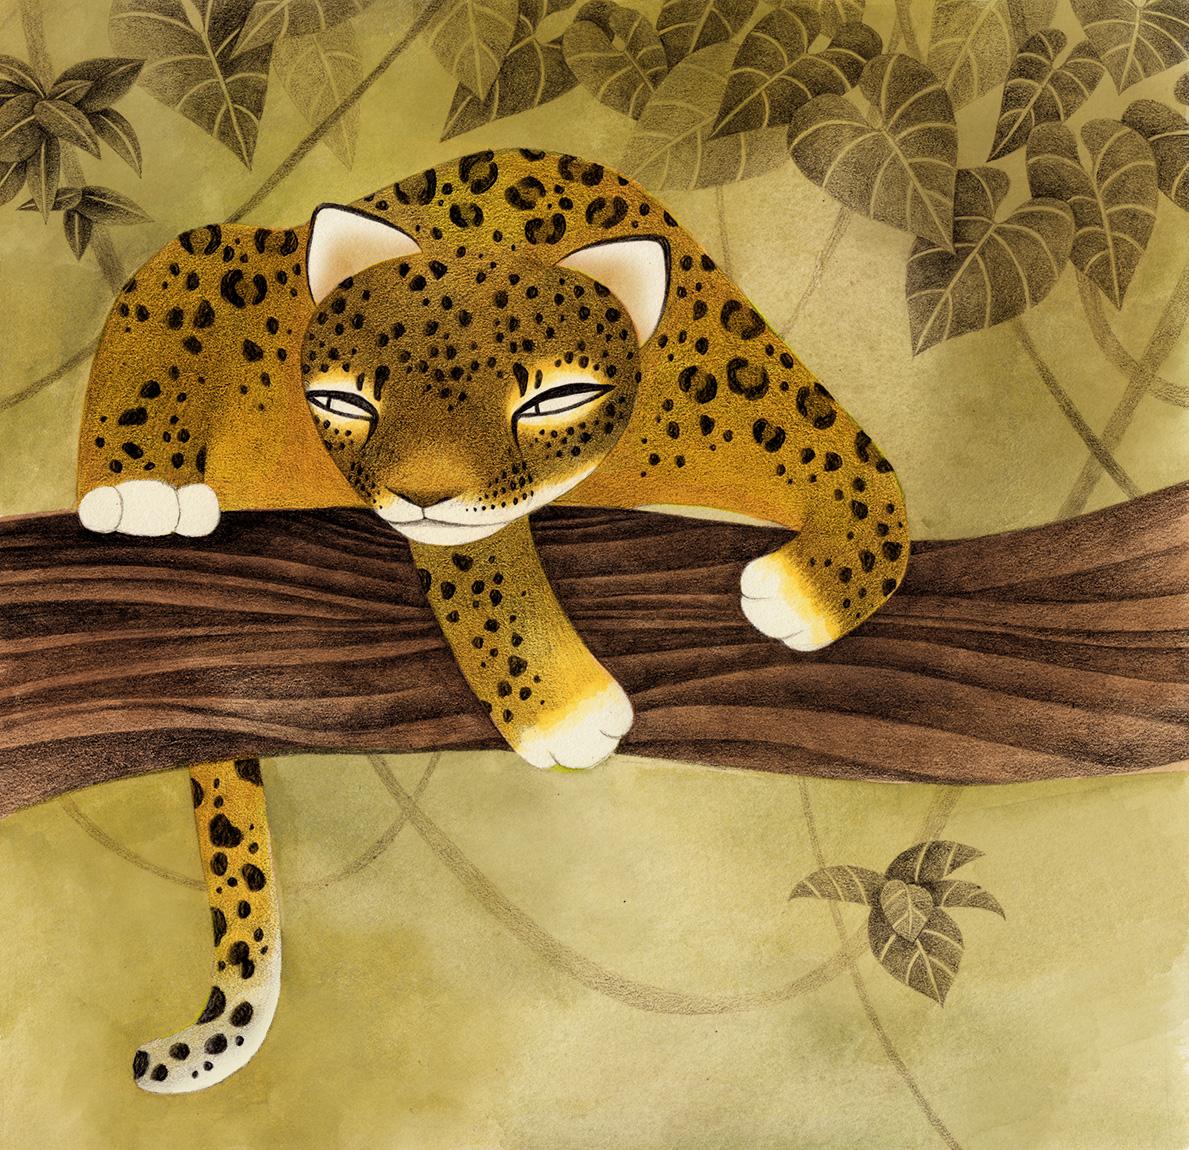 jaguartree_color.jpg